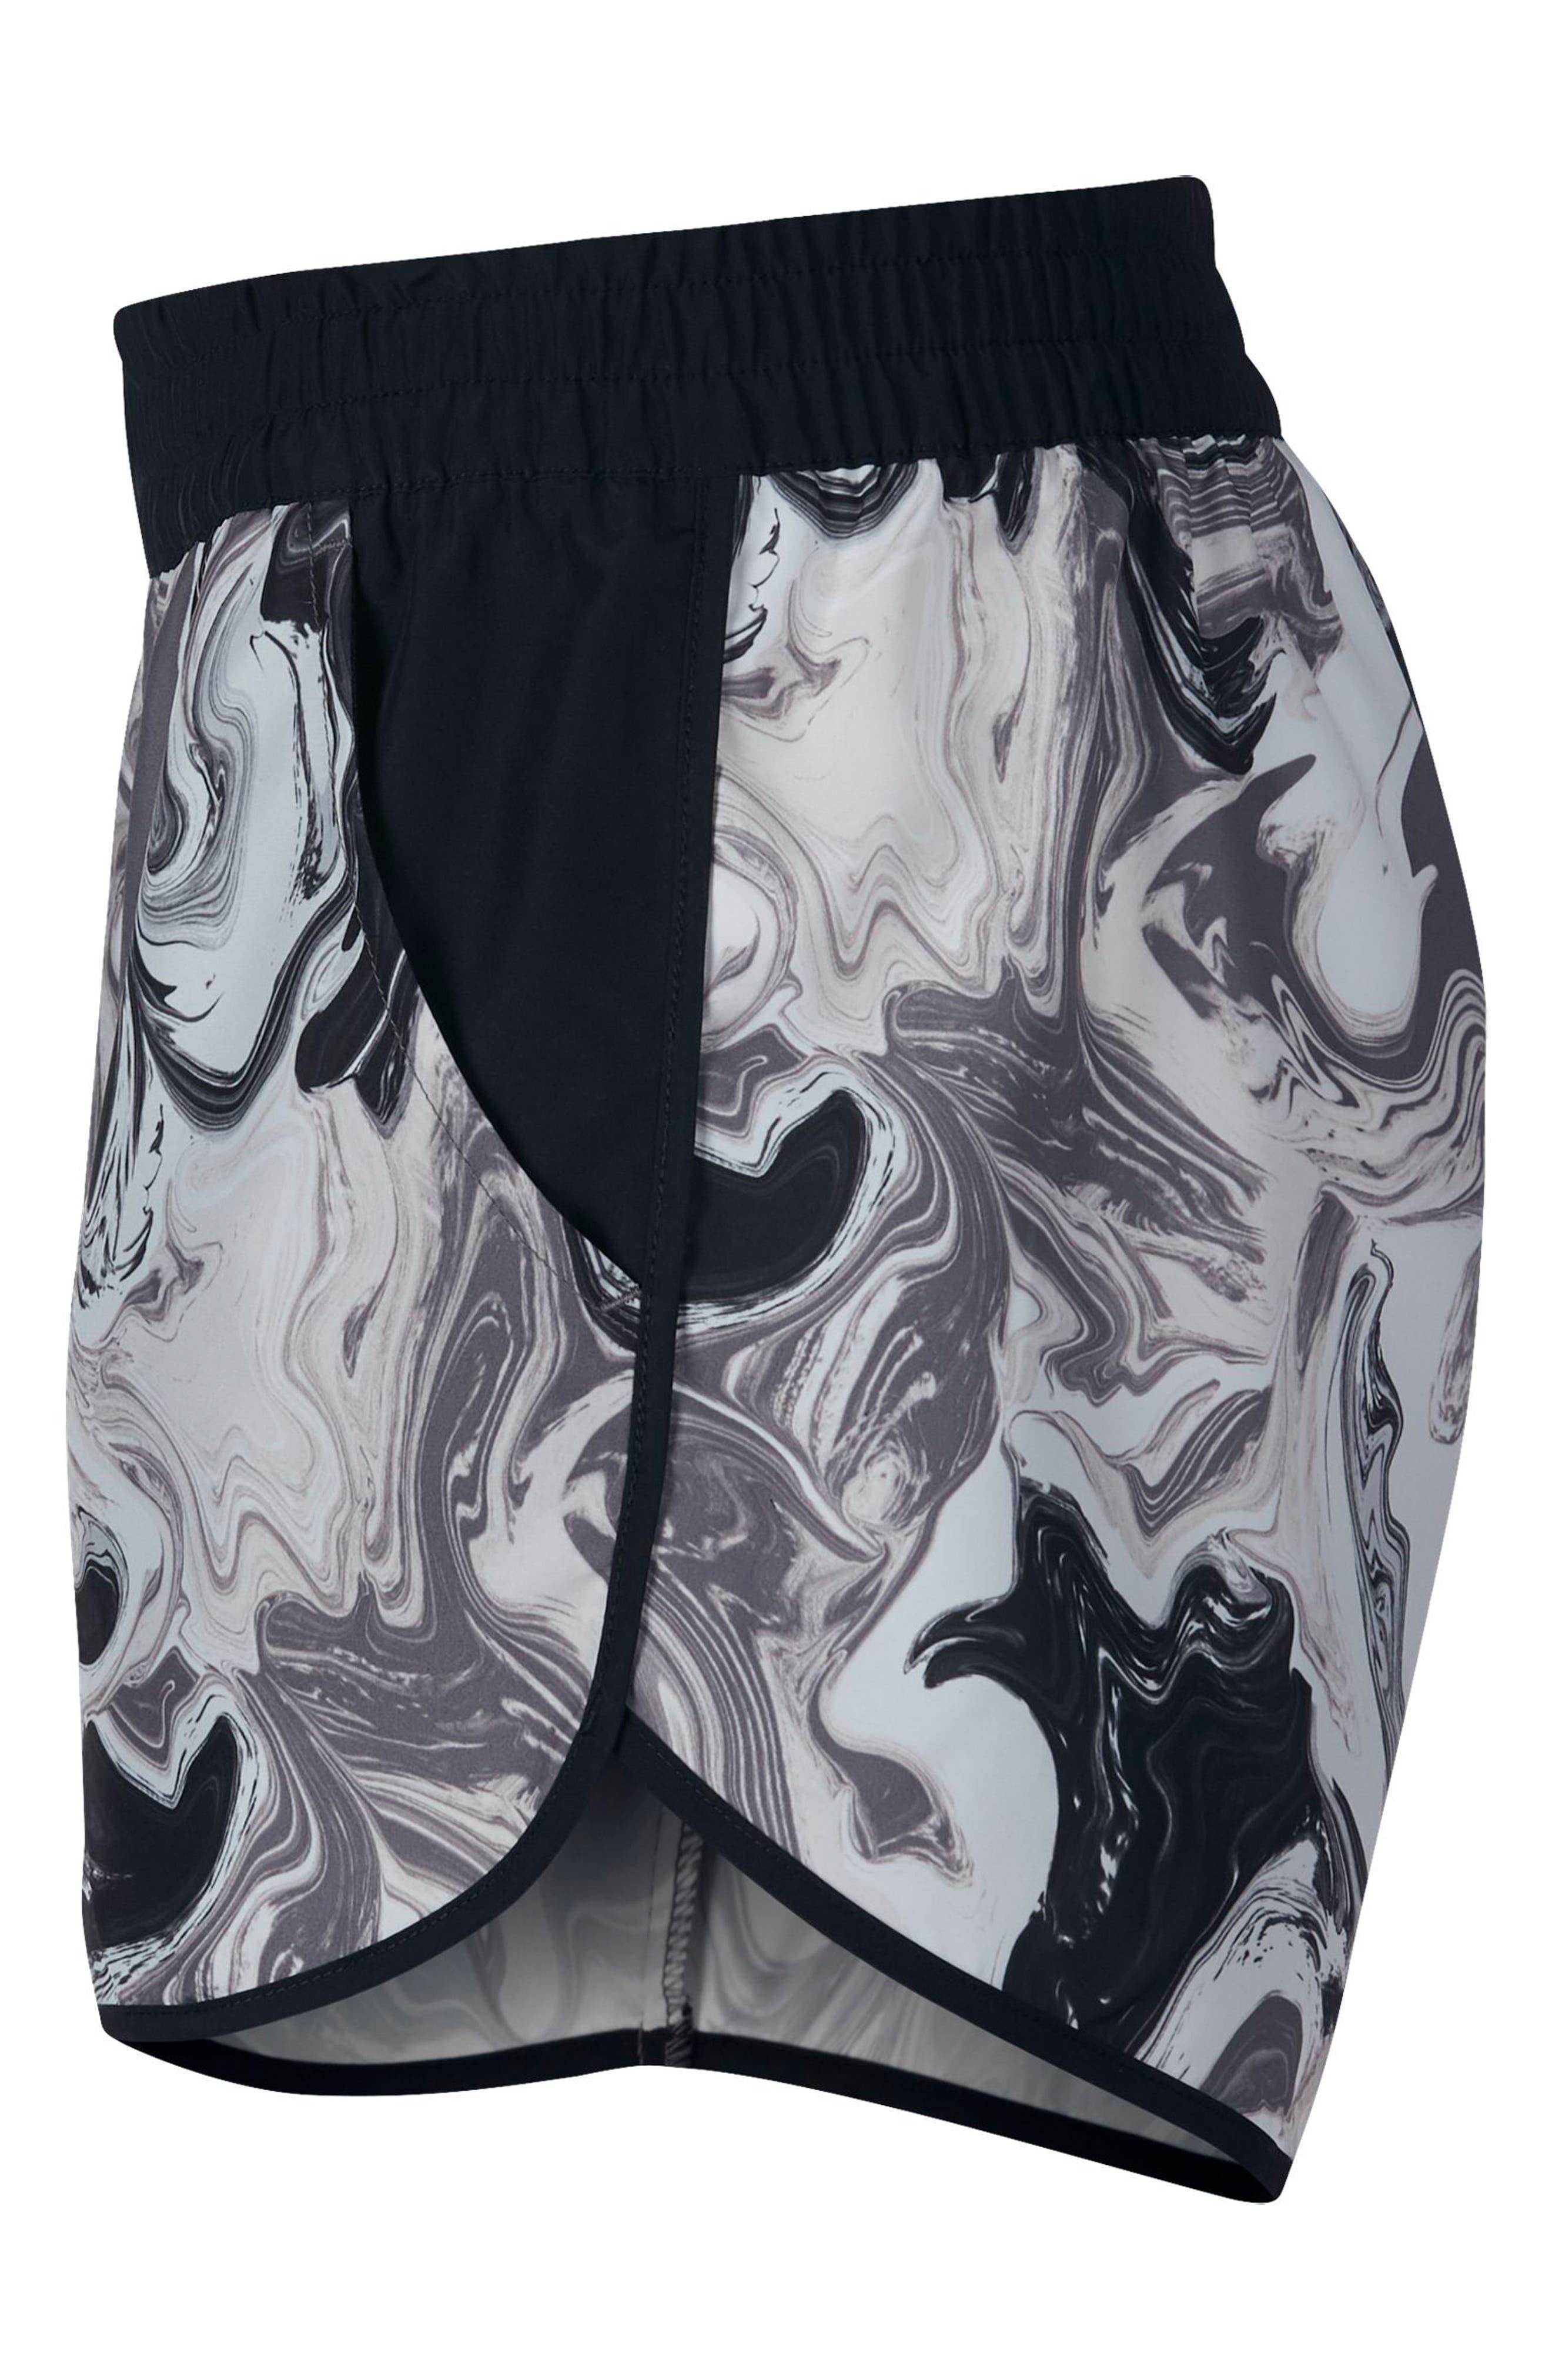 Sportswear Women's Shorts,                             Alternate thumbnail 9, color,                             036